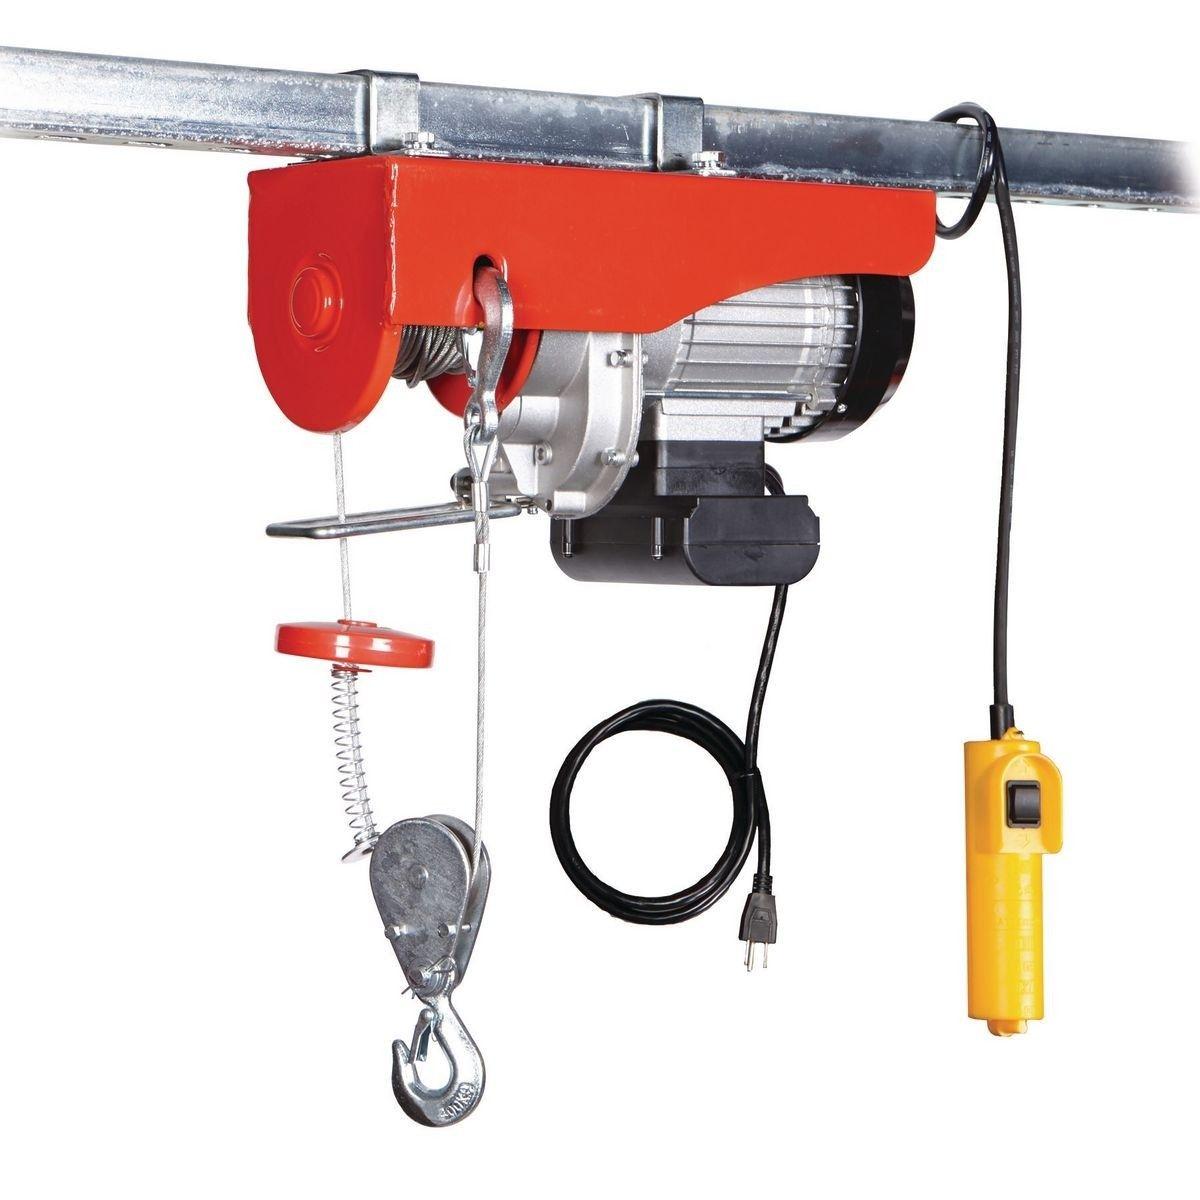 880 Lb Electric Hoist With Remote Control In 2020 Hoist Garage Hoist Garage Workshop Organization